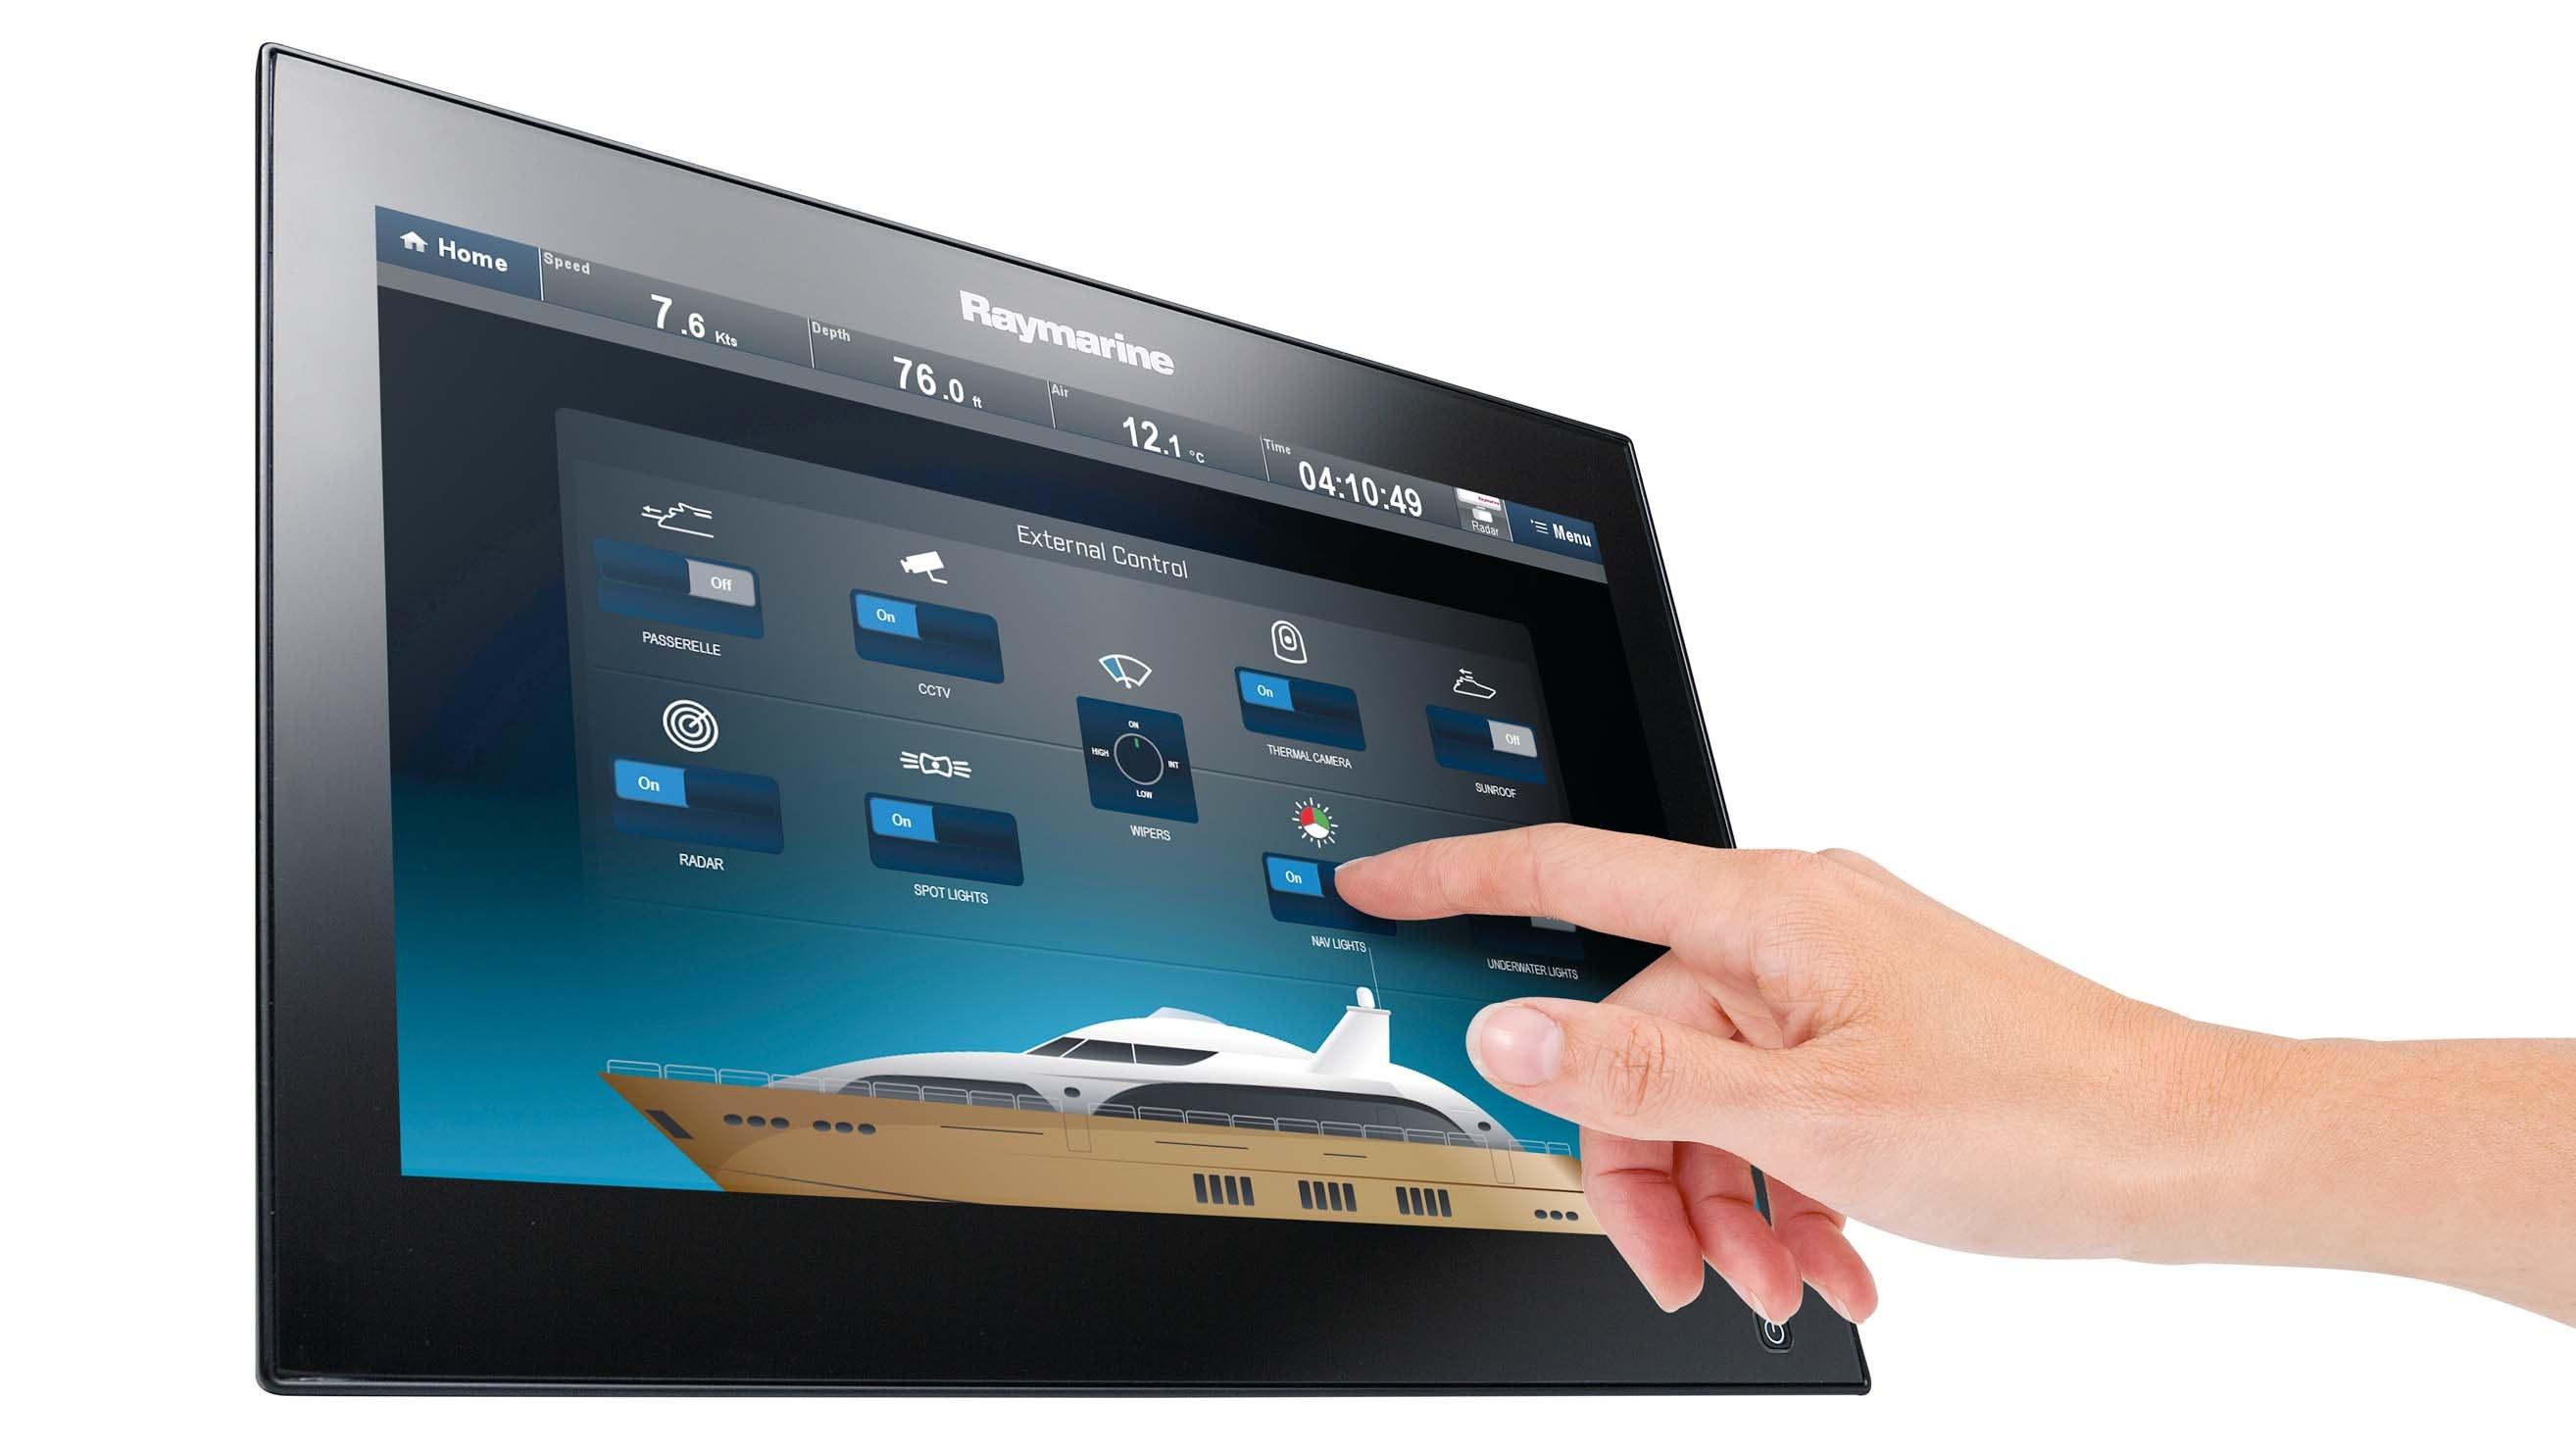 Digital Switching - prstom prema ploteru